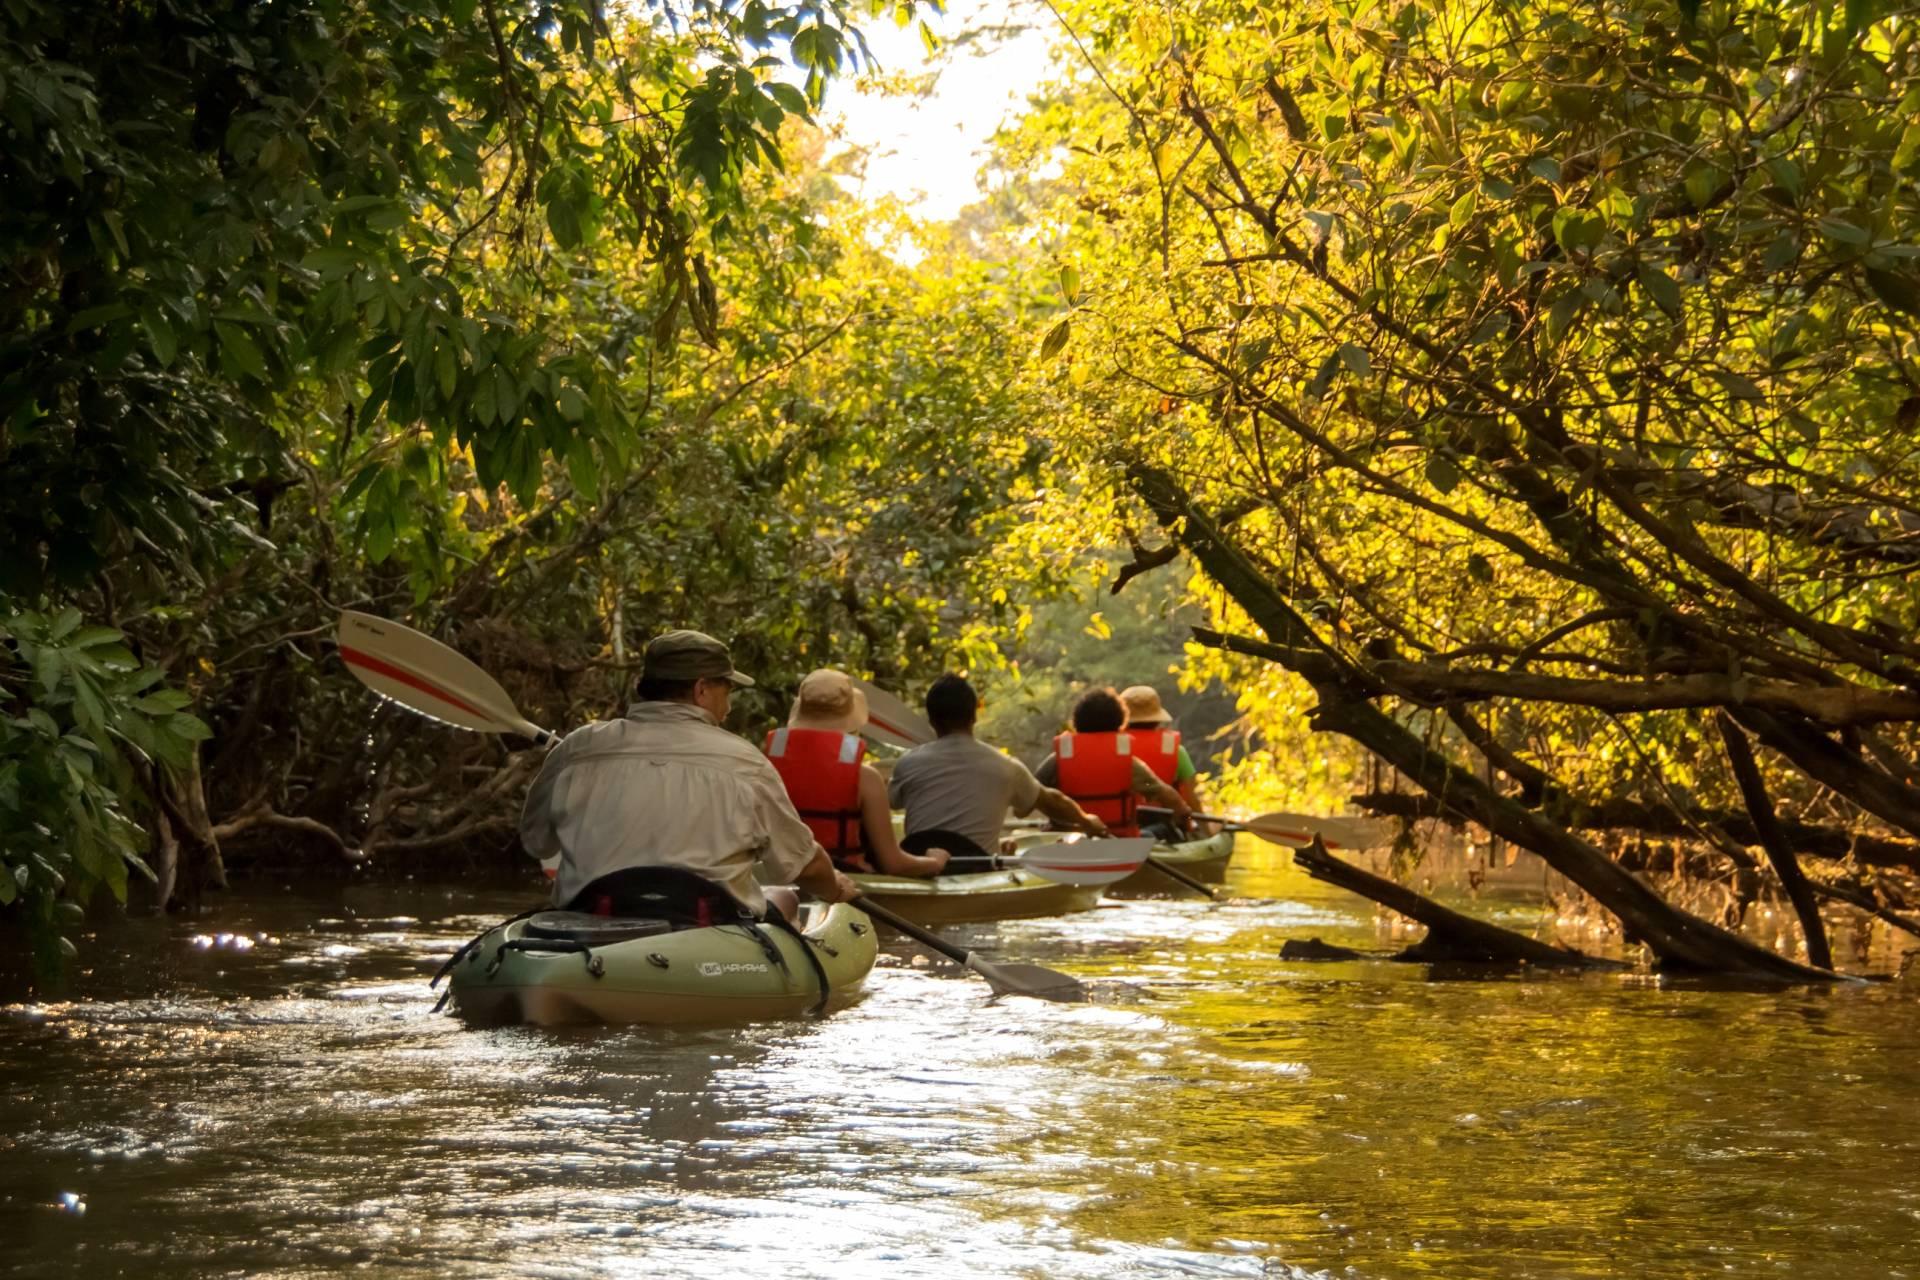 Kajak-Touren durch den Amazonas - Ecuador Reisen - Aktivtouren und Abenteuer